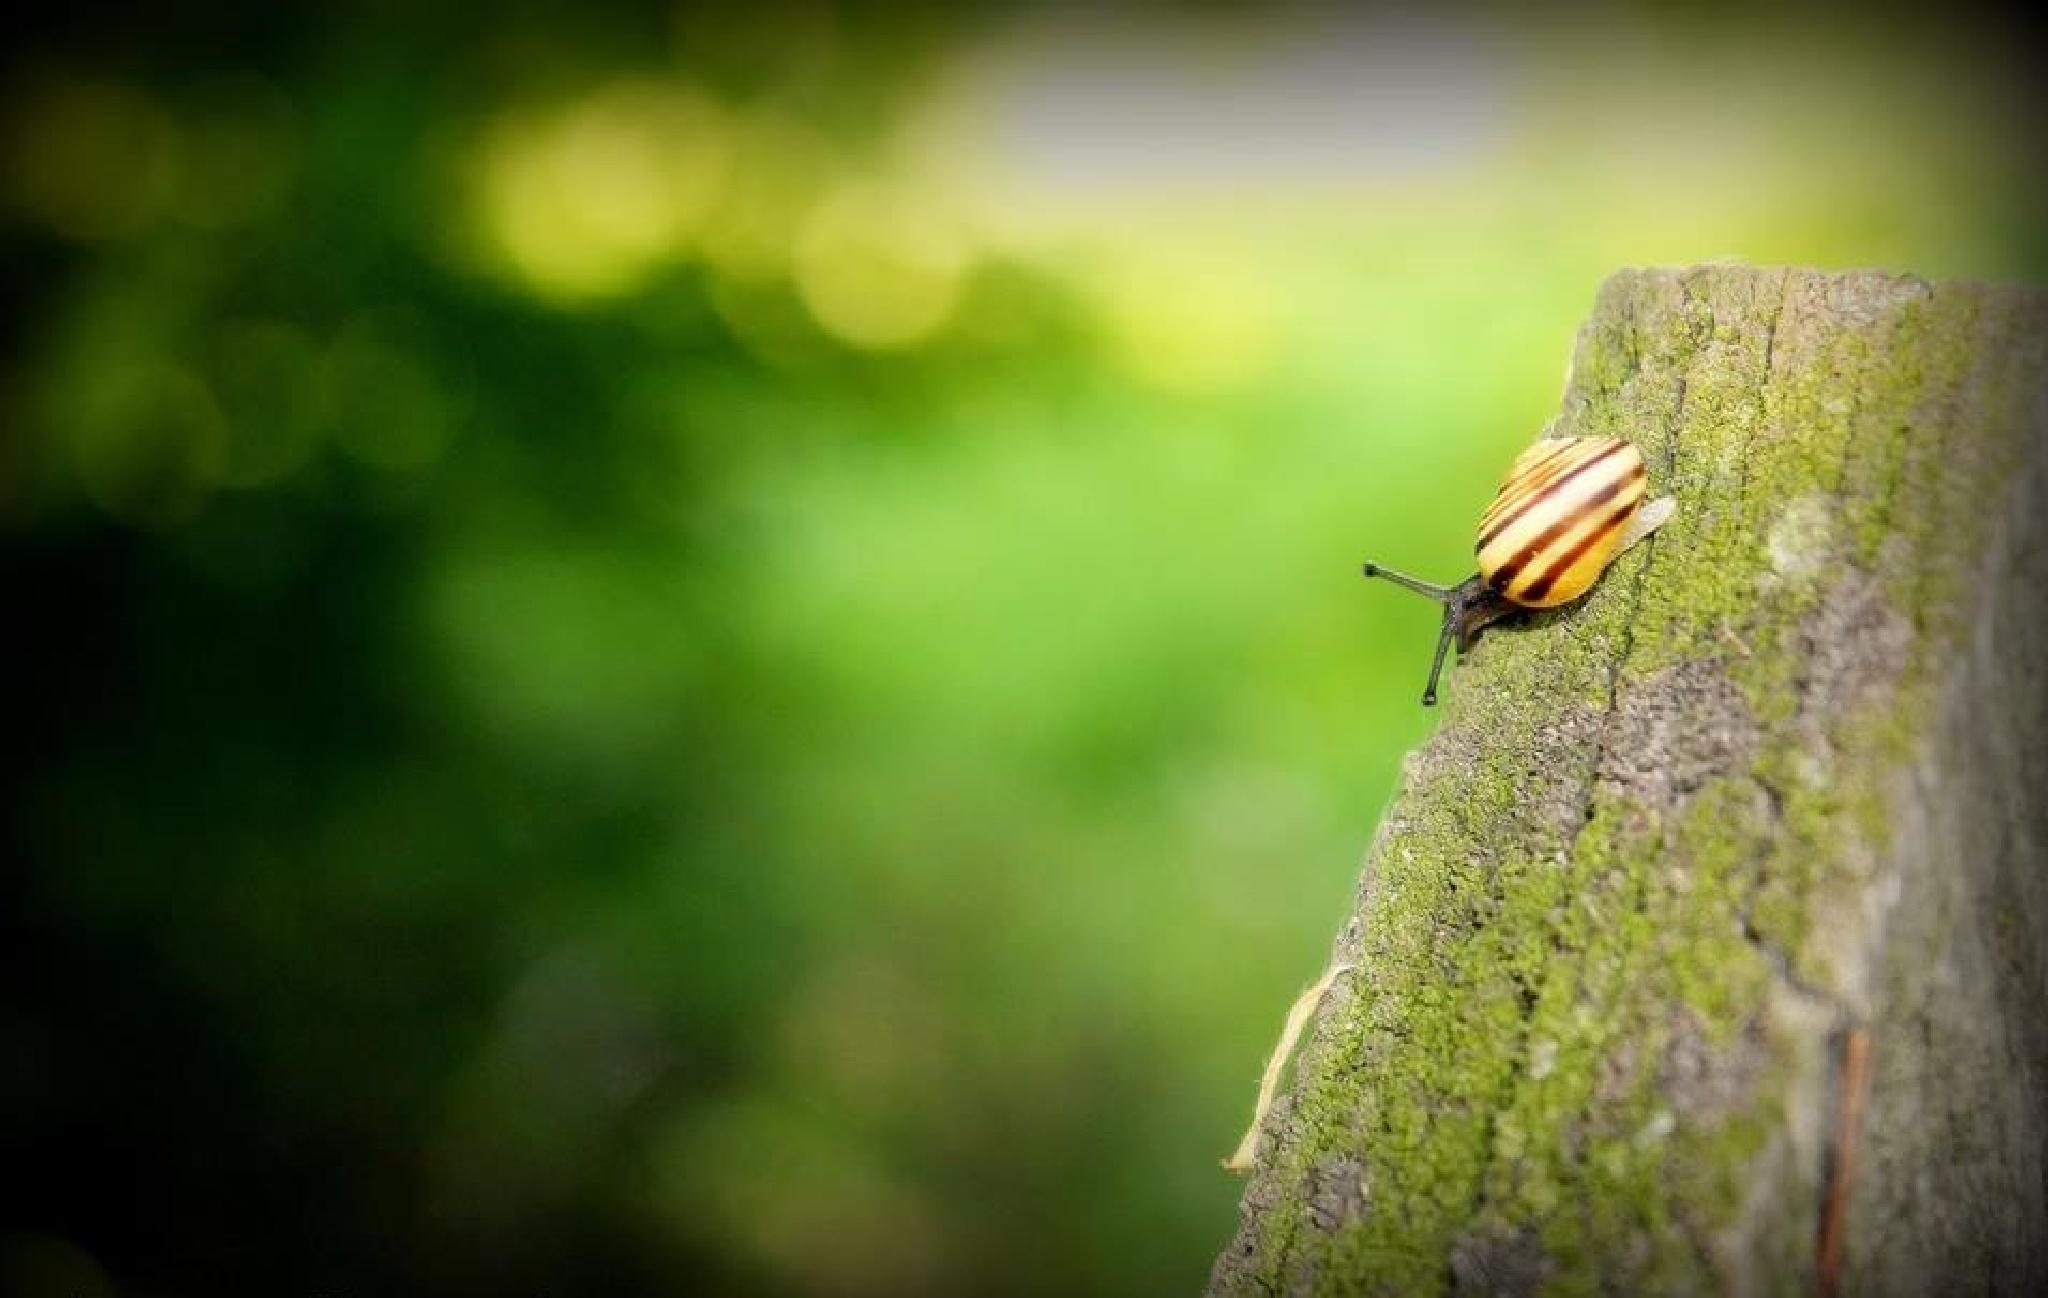 Snail by Agata